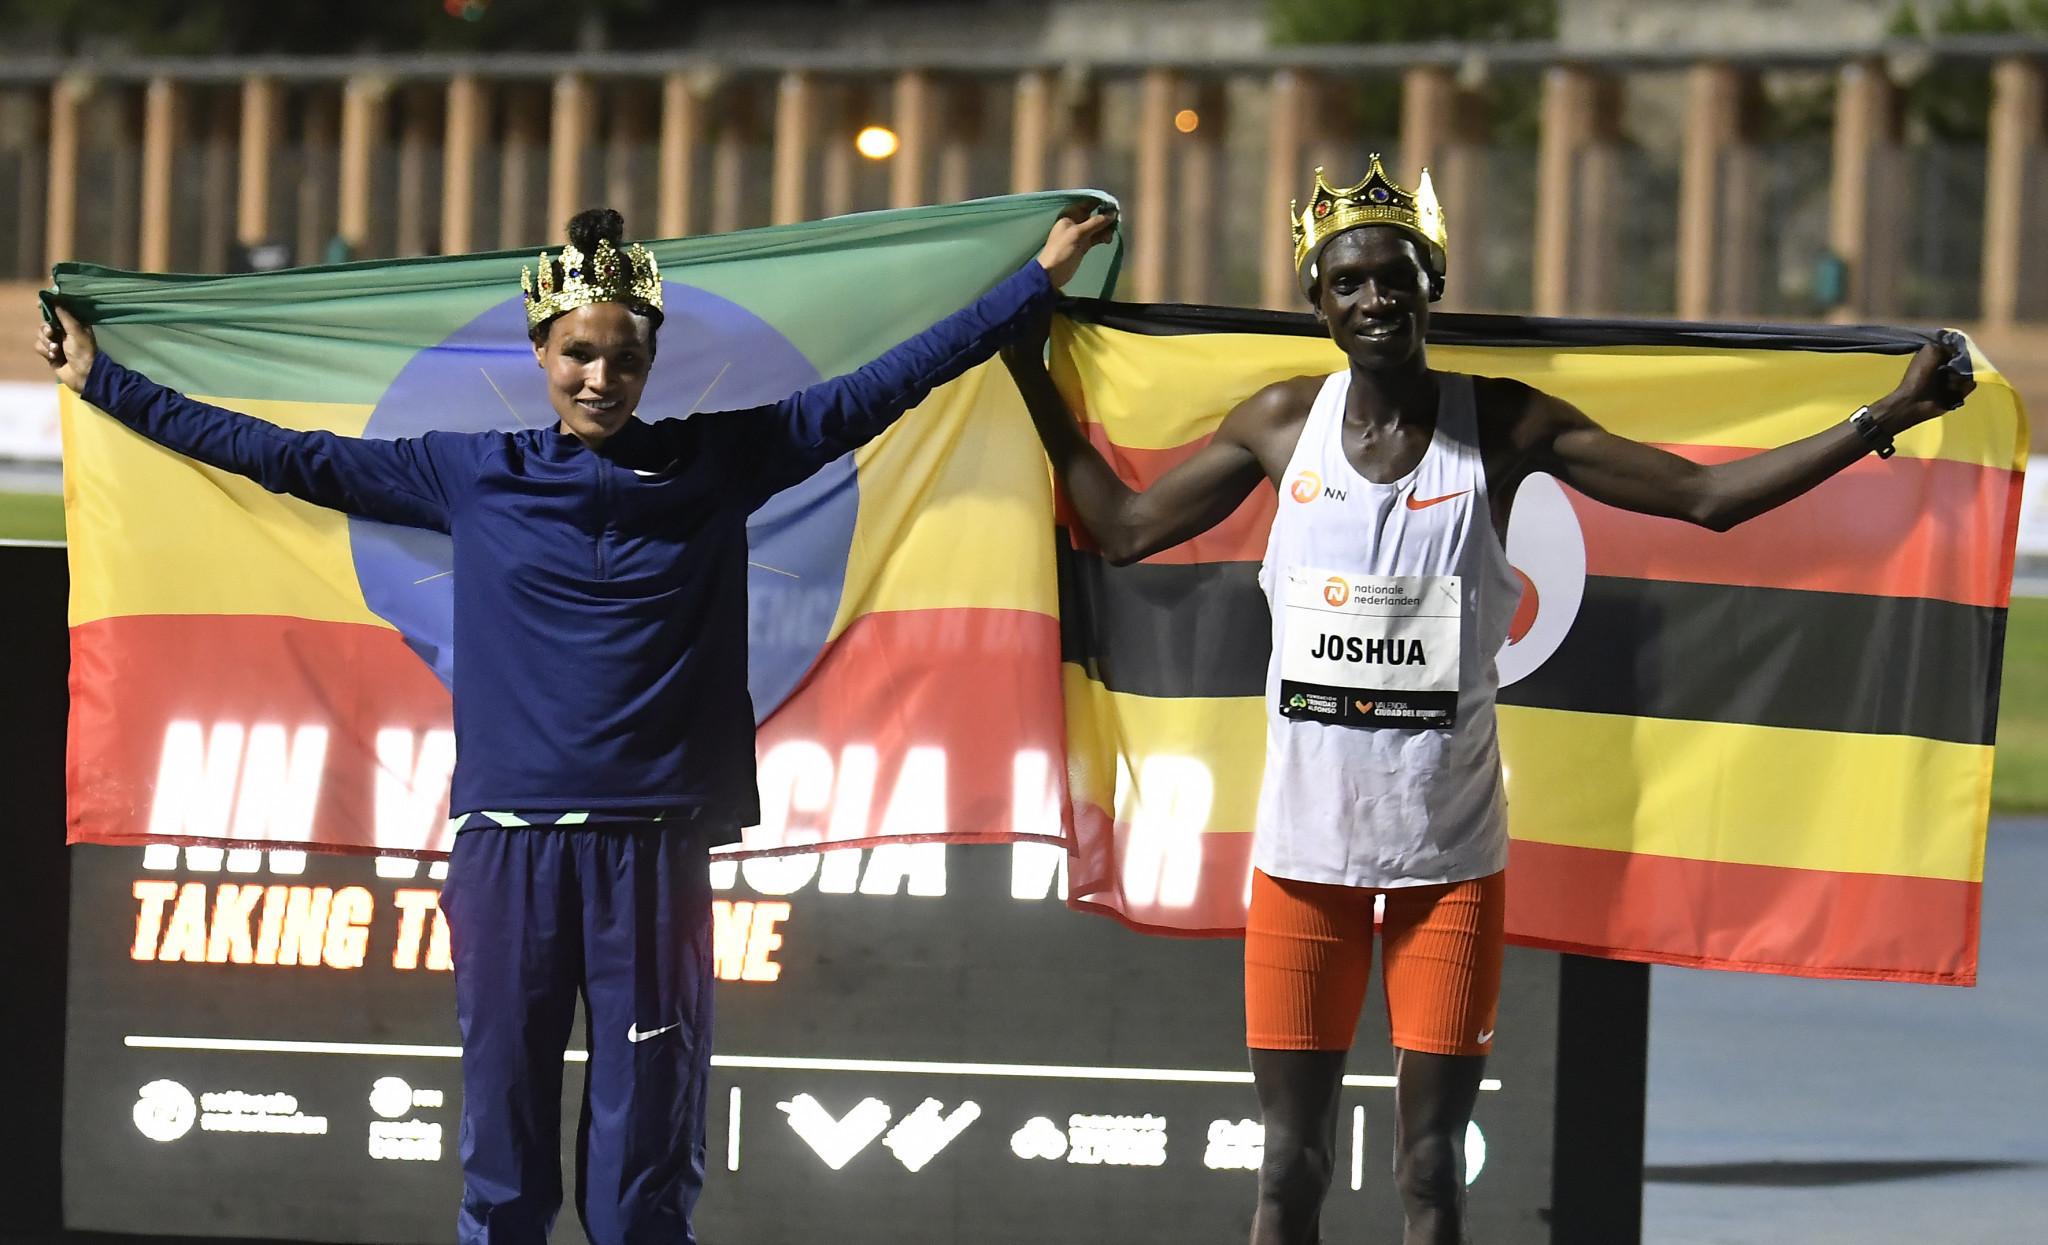 Athletes such as Letesenbet Gidey and Joshua Cheptegei have used Wavelight technology to break world records this season ©World Athletics